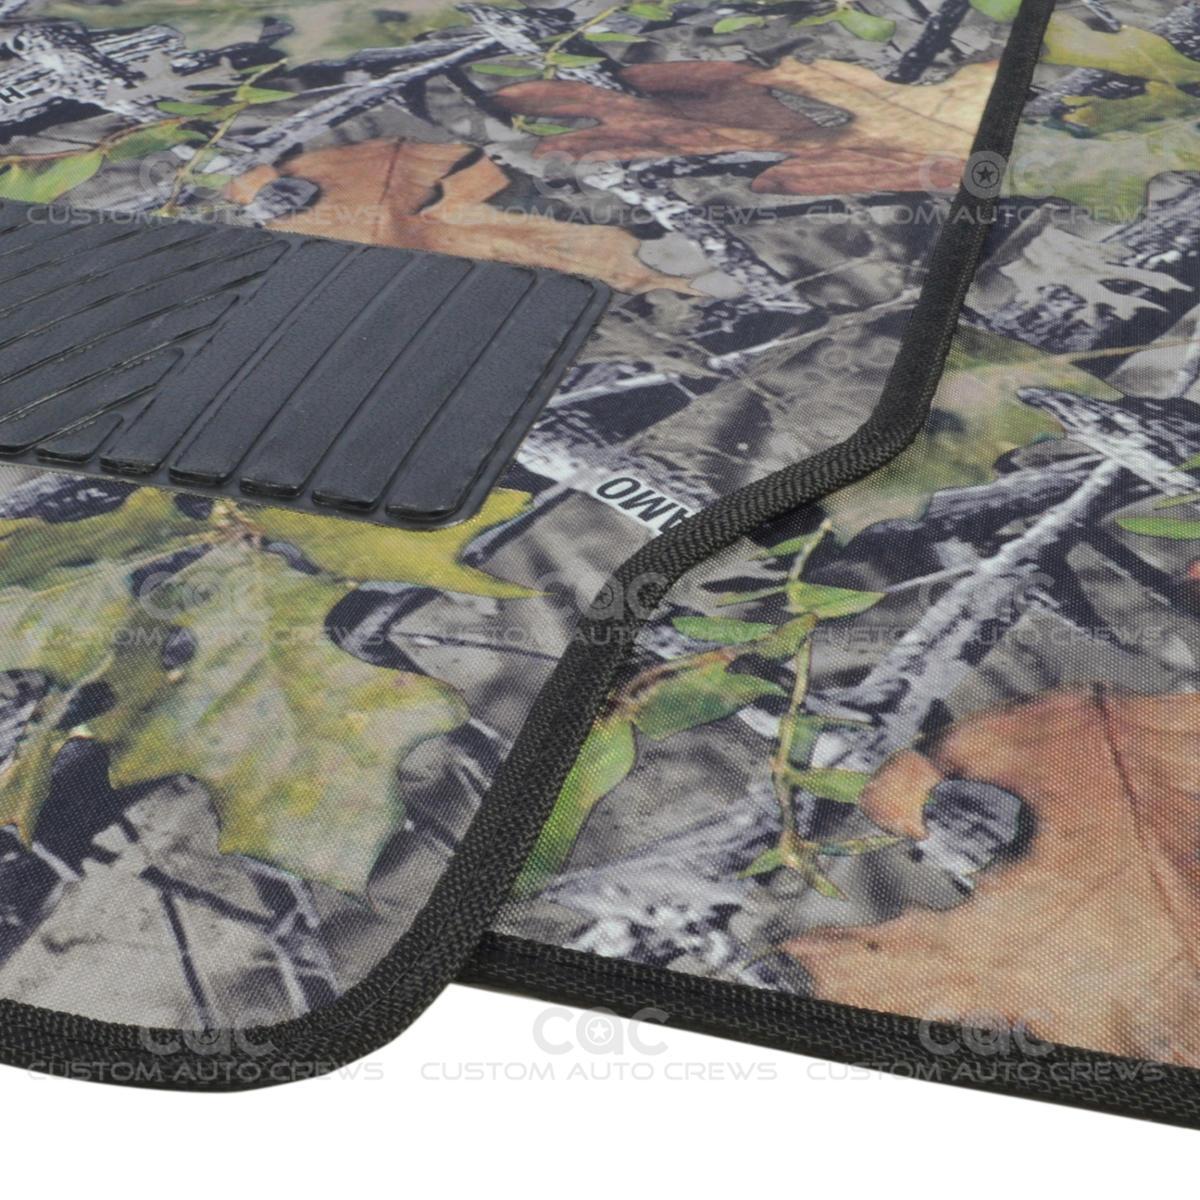 Camo Mats For Car Suv Truck 4 Pc Car Floor Mat